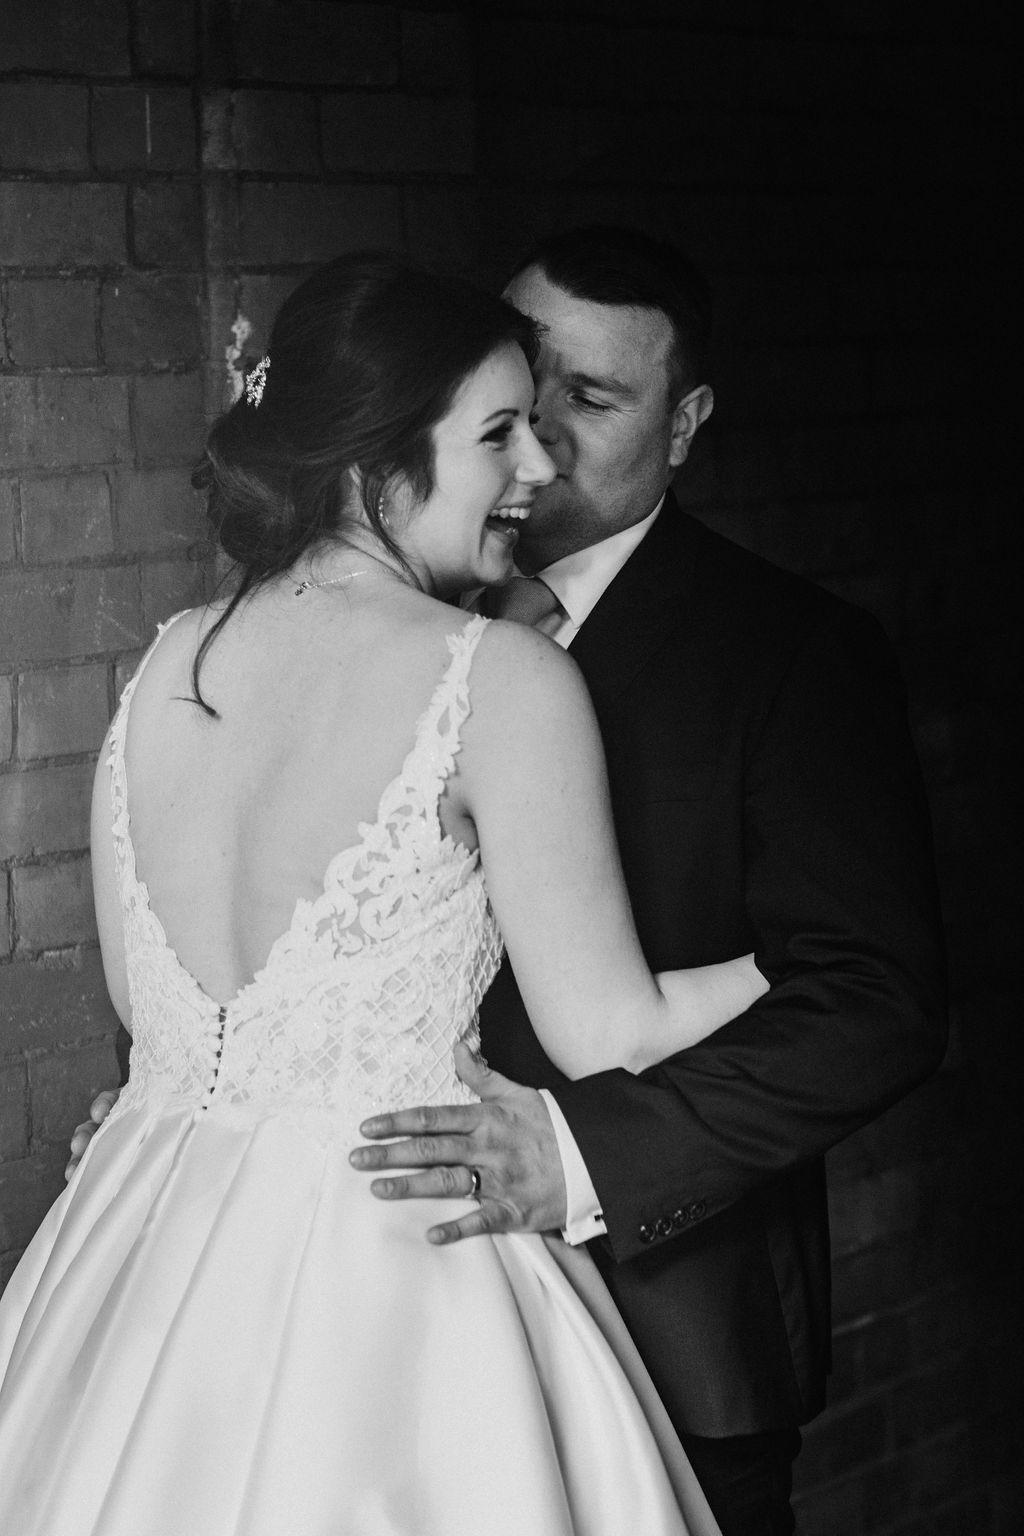 Your_Wedding_Day_450.jpg